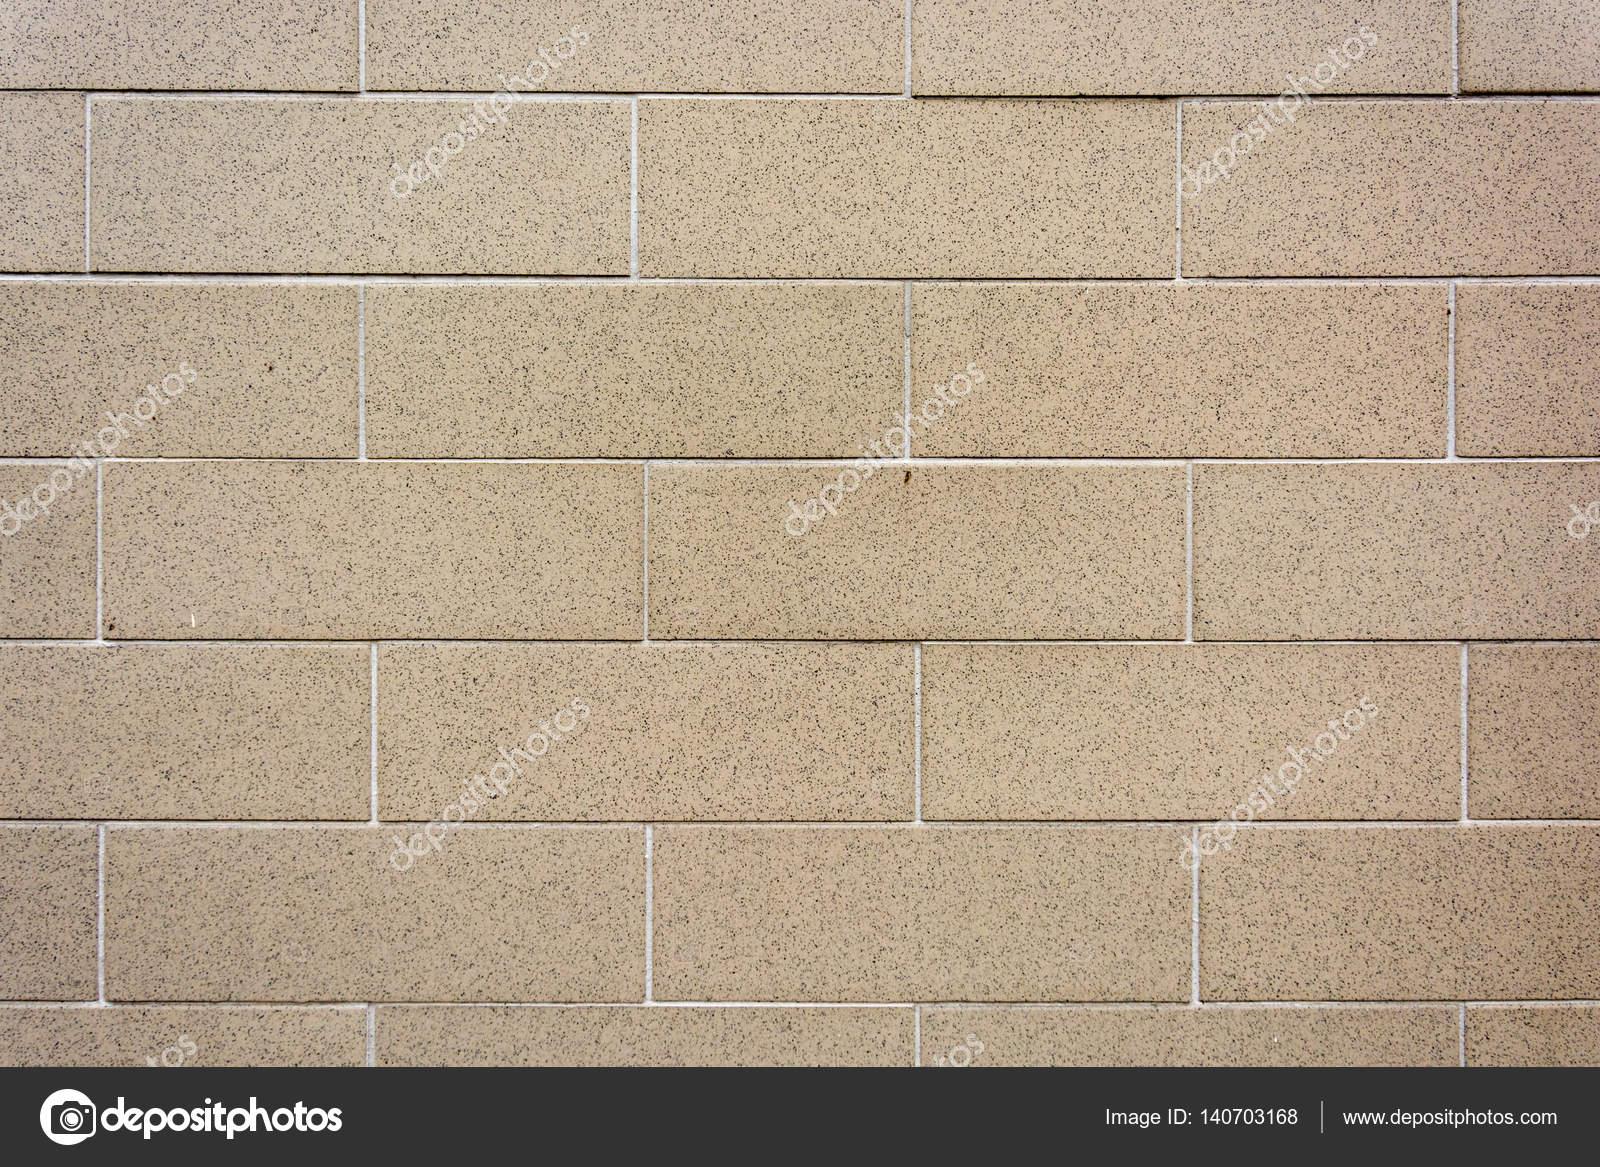 Muro di piastrelle di texture caffè bianco u foto stock